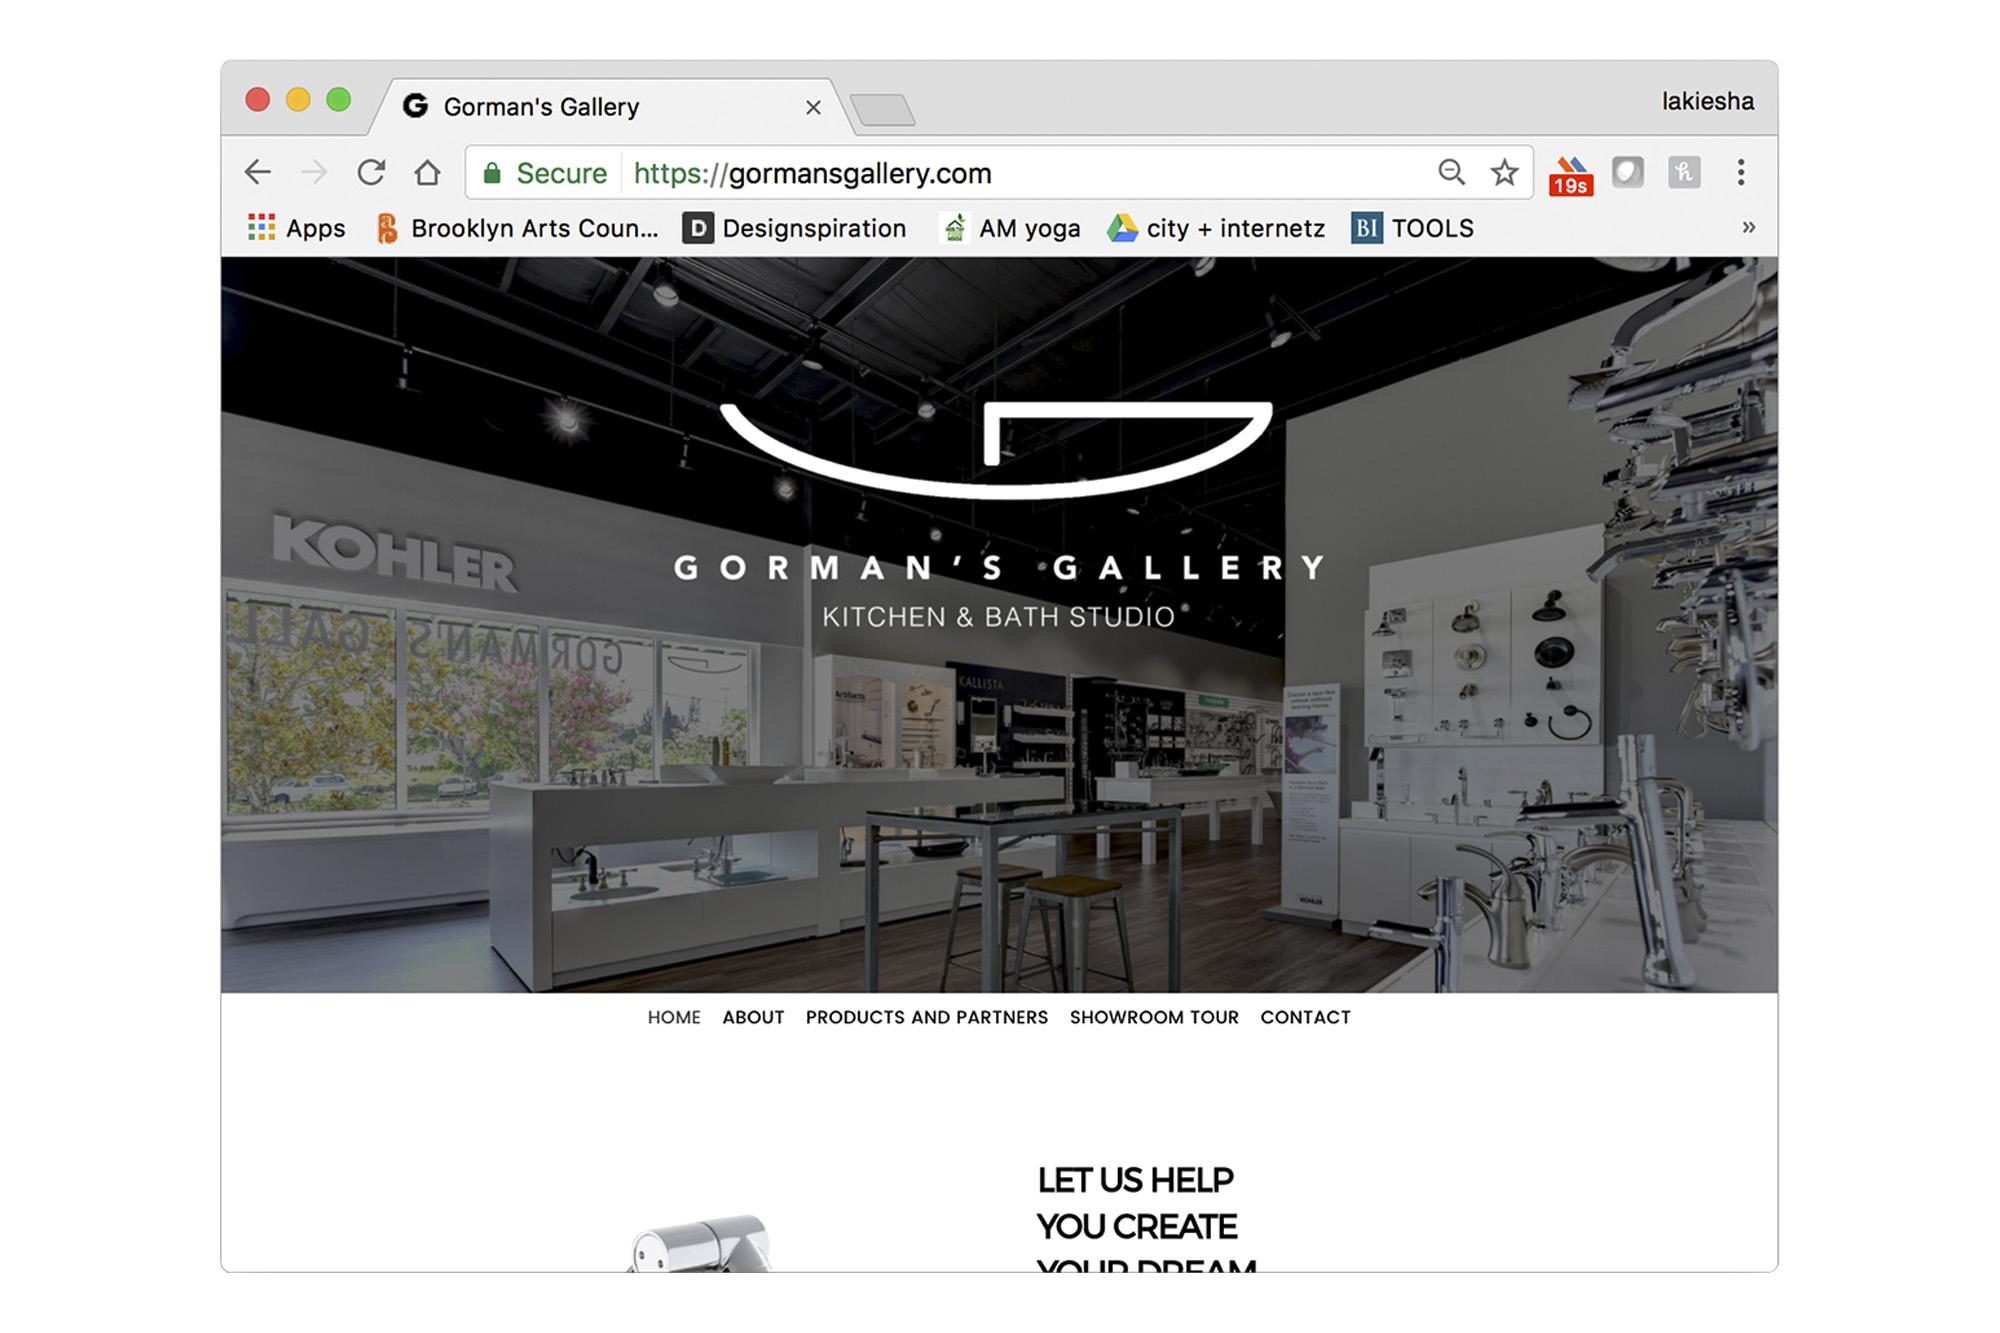 Gormans Gallery website1.jpg